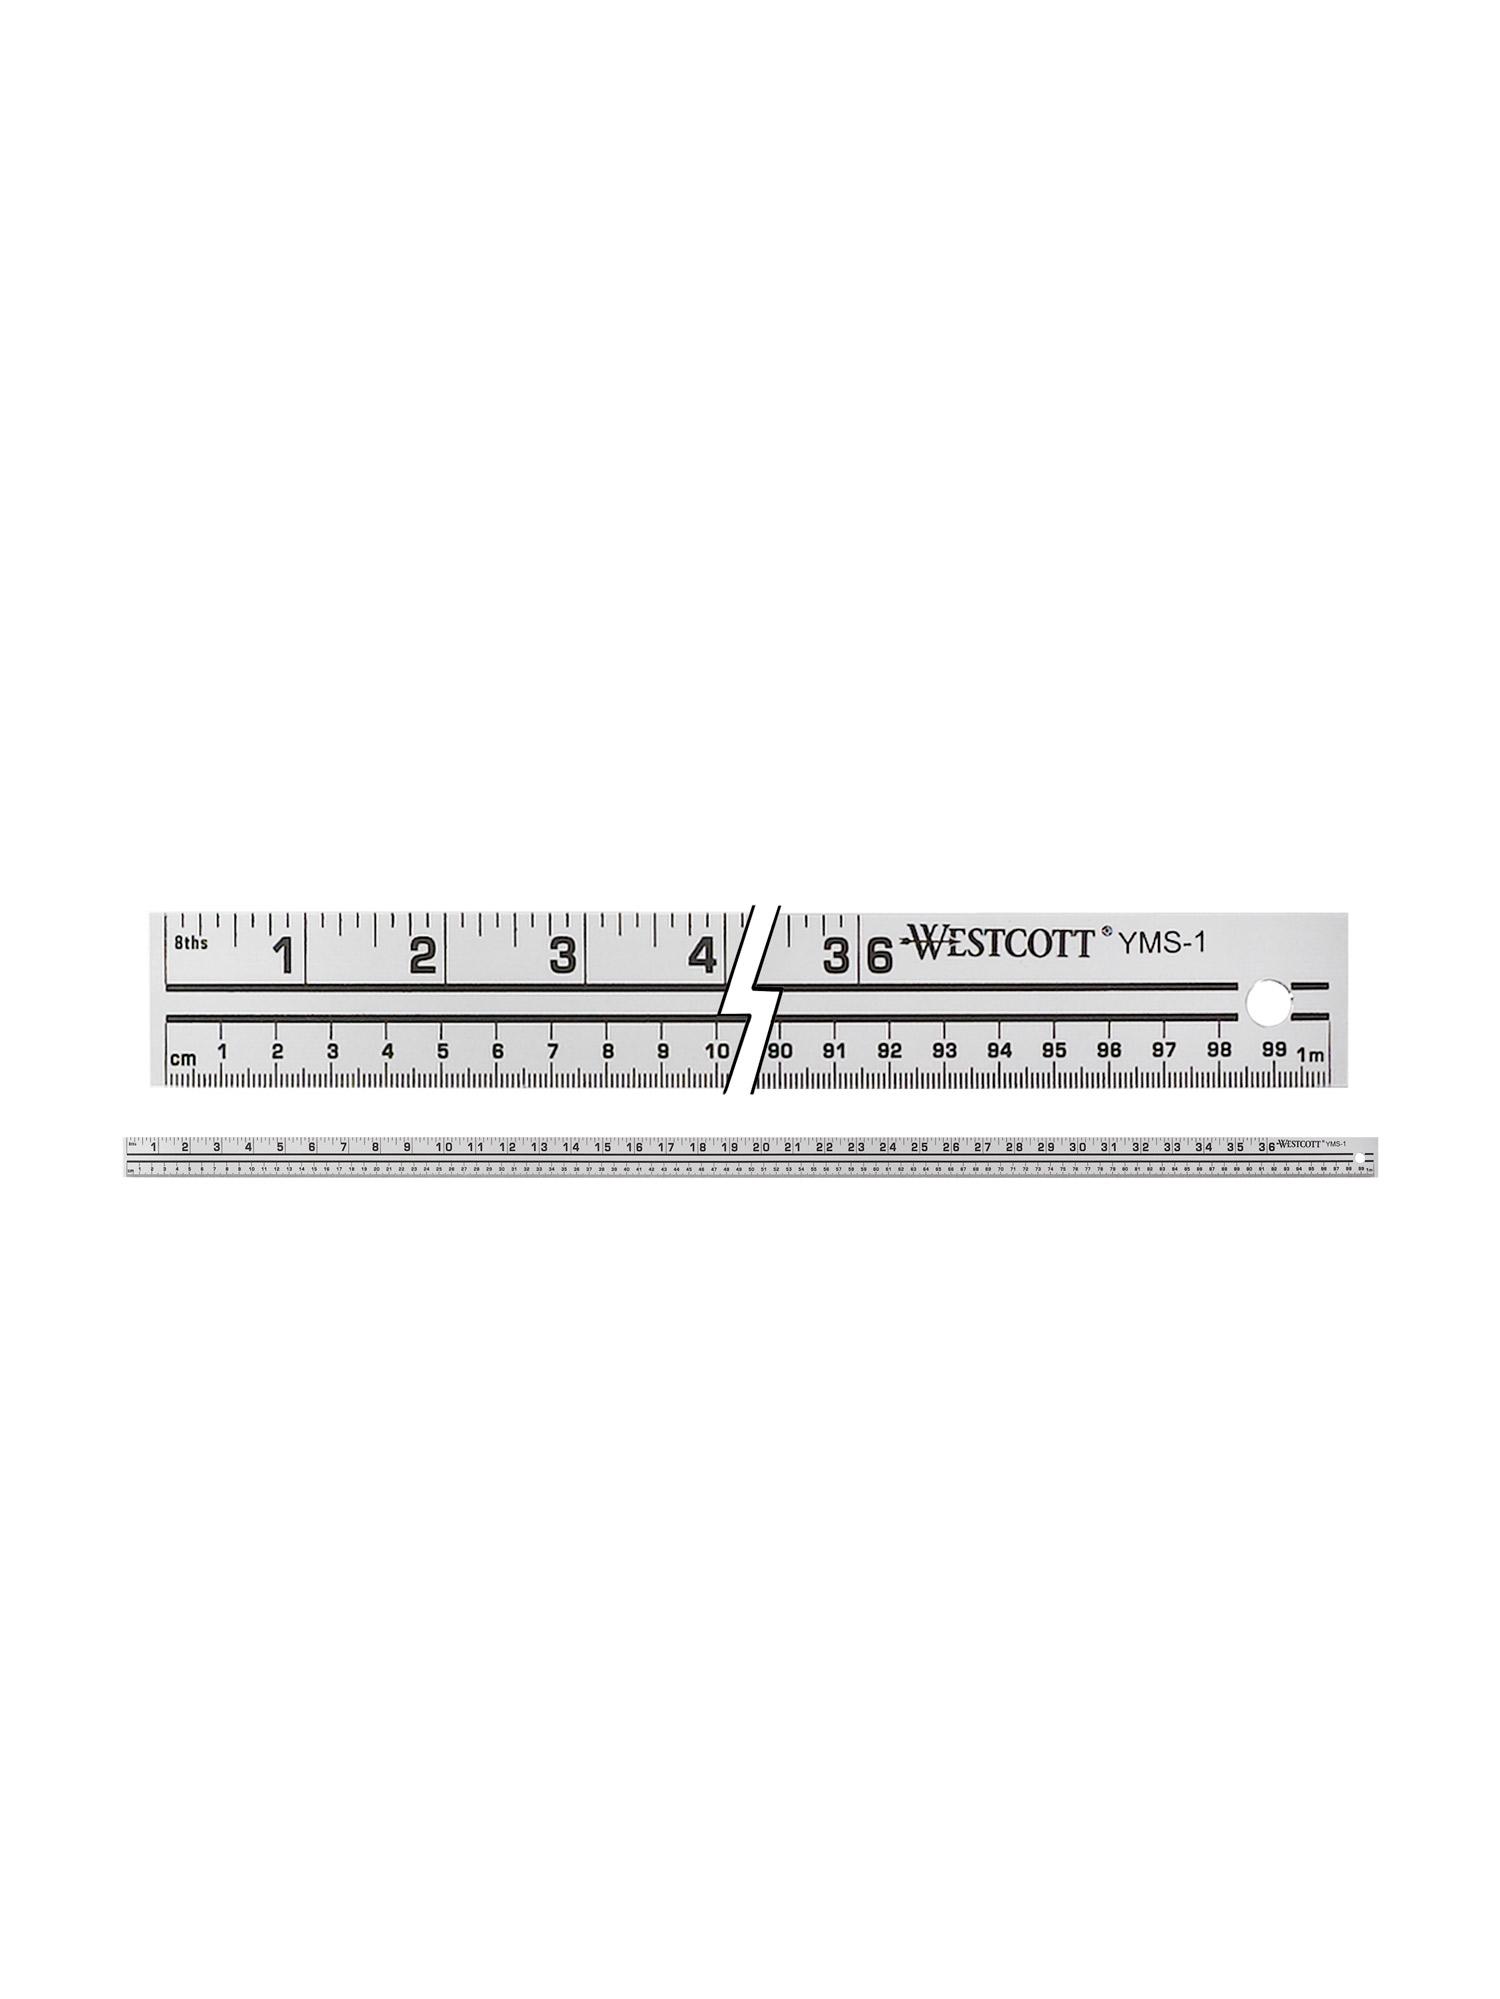 hight resolution of 5 flat wiring diagram wescott wiring library 5 flat wiring diagram wescott